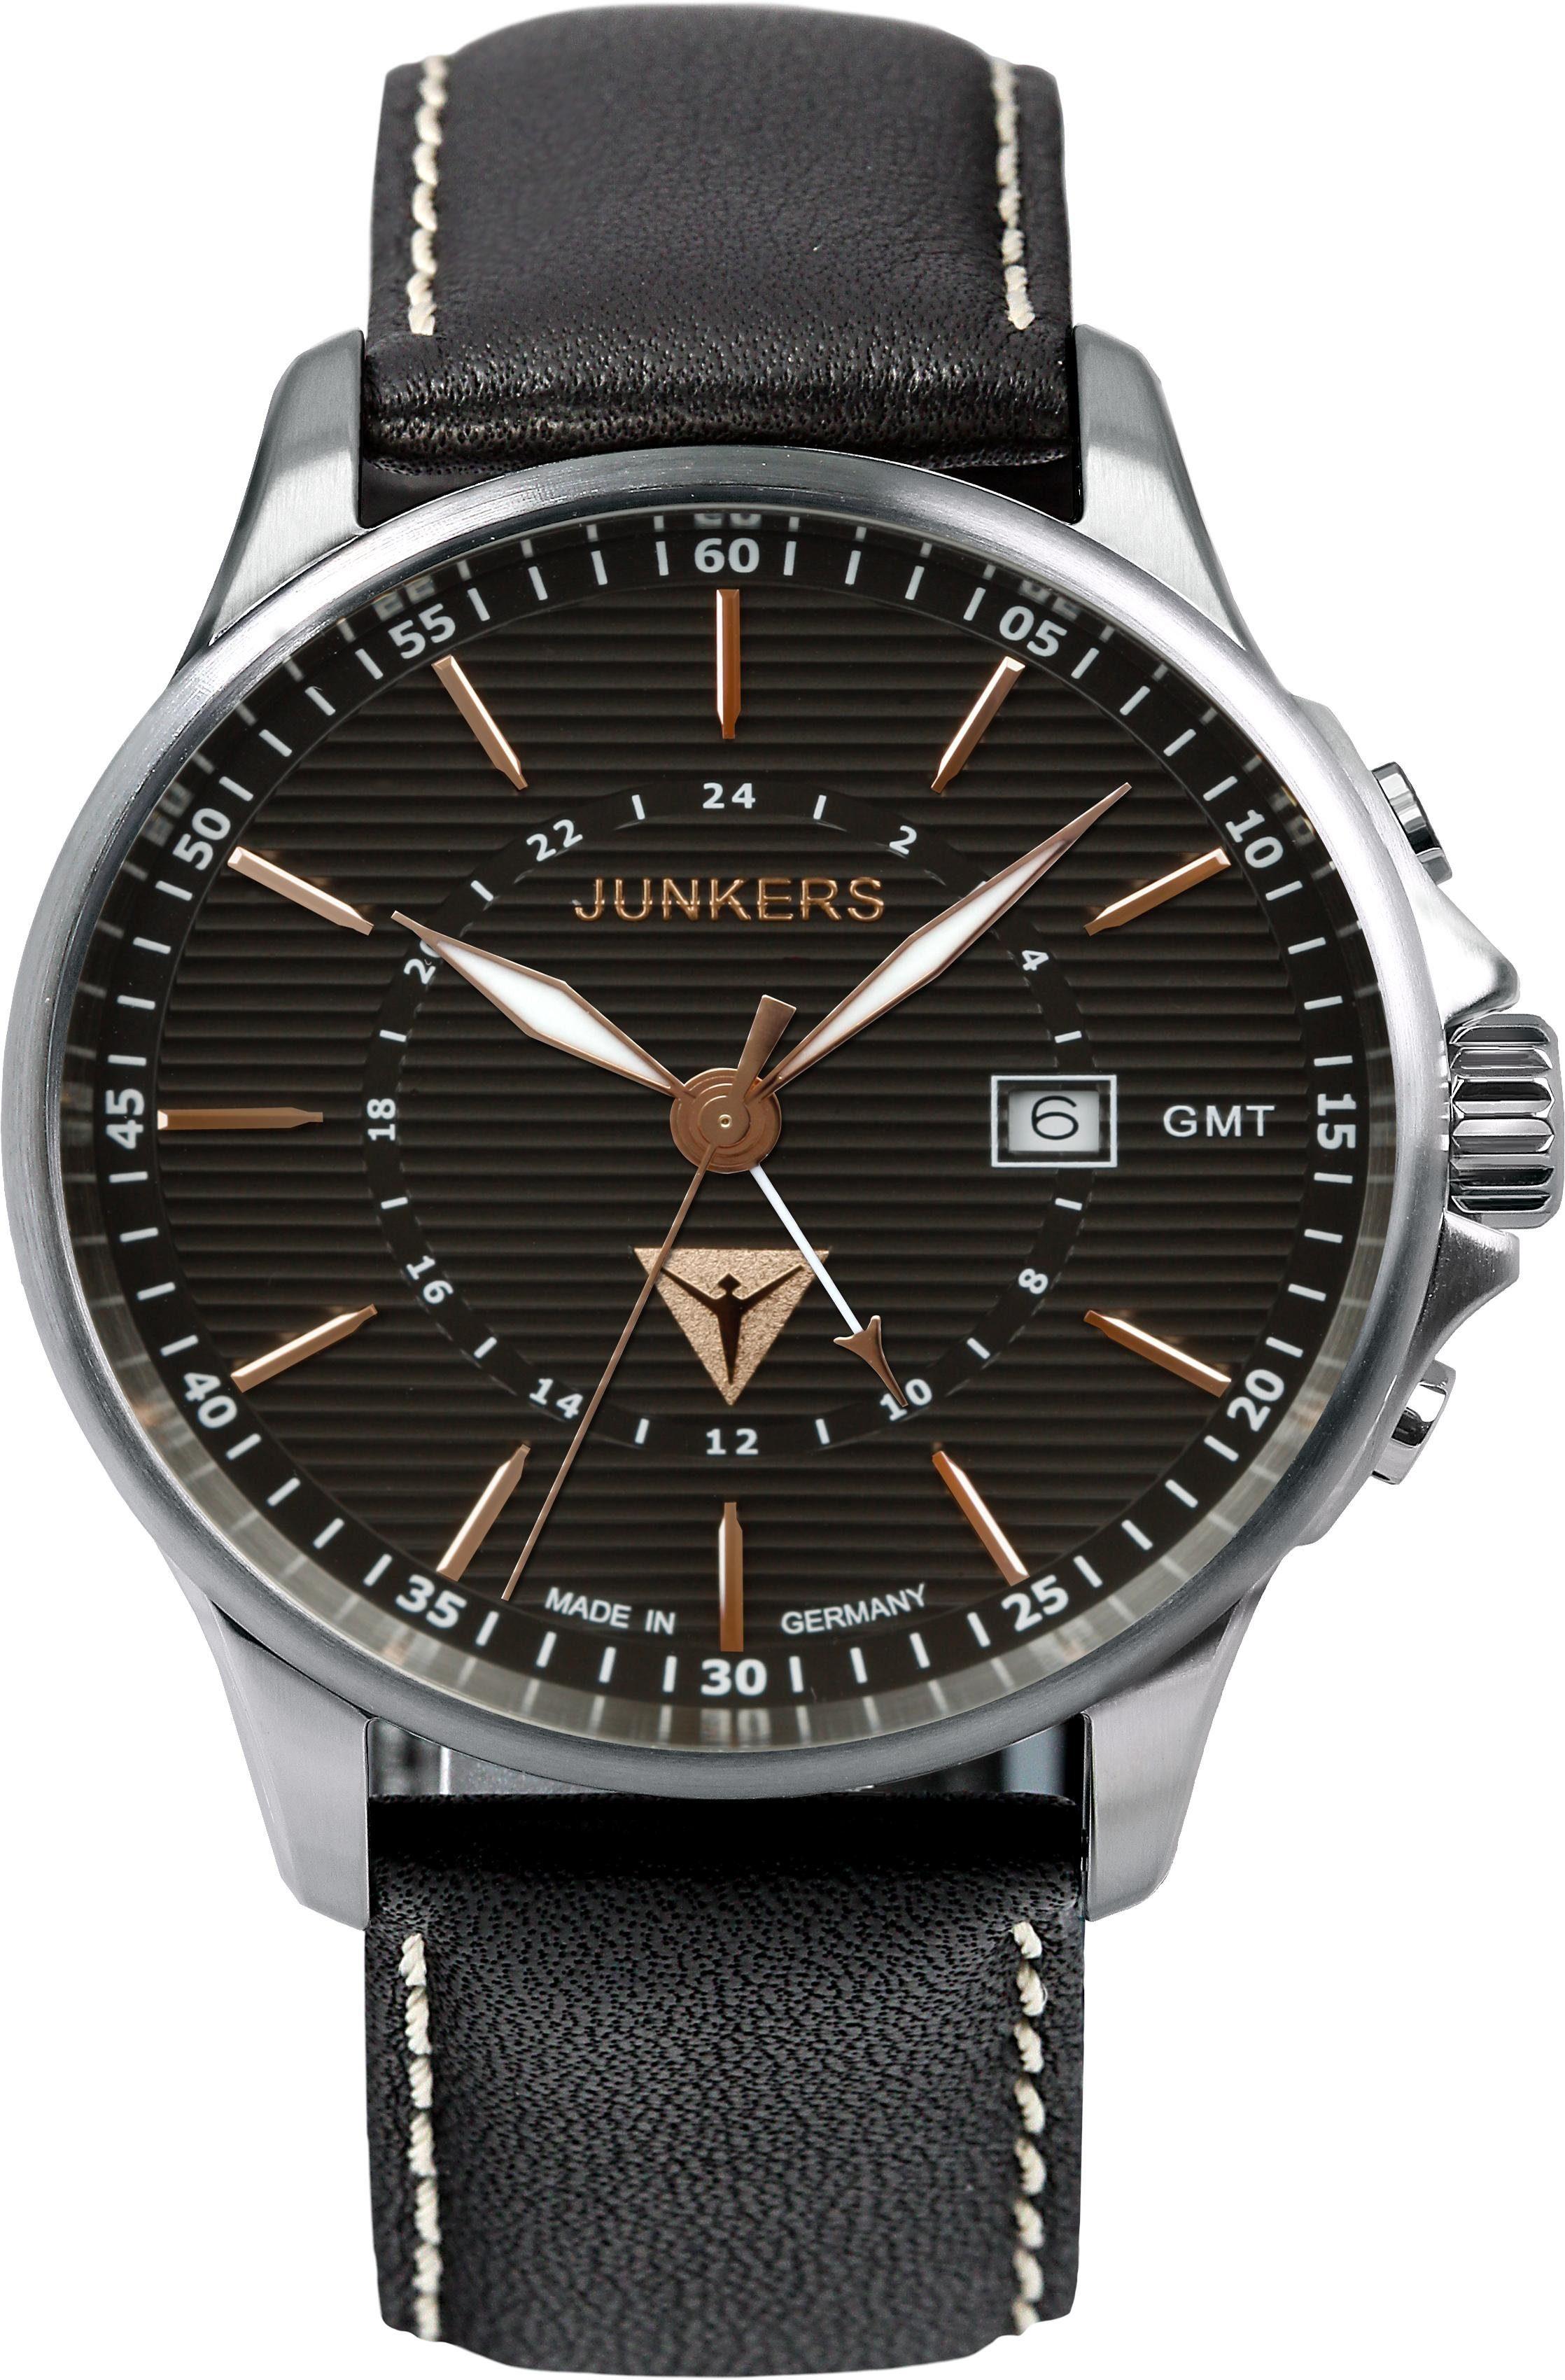 Junkers-Uhren Quarzuhr »Tante Ju, 6842-5«, Made in Germany